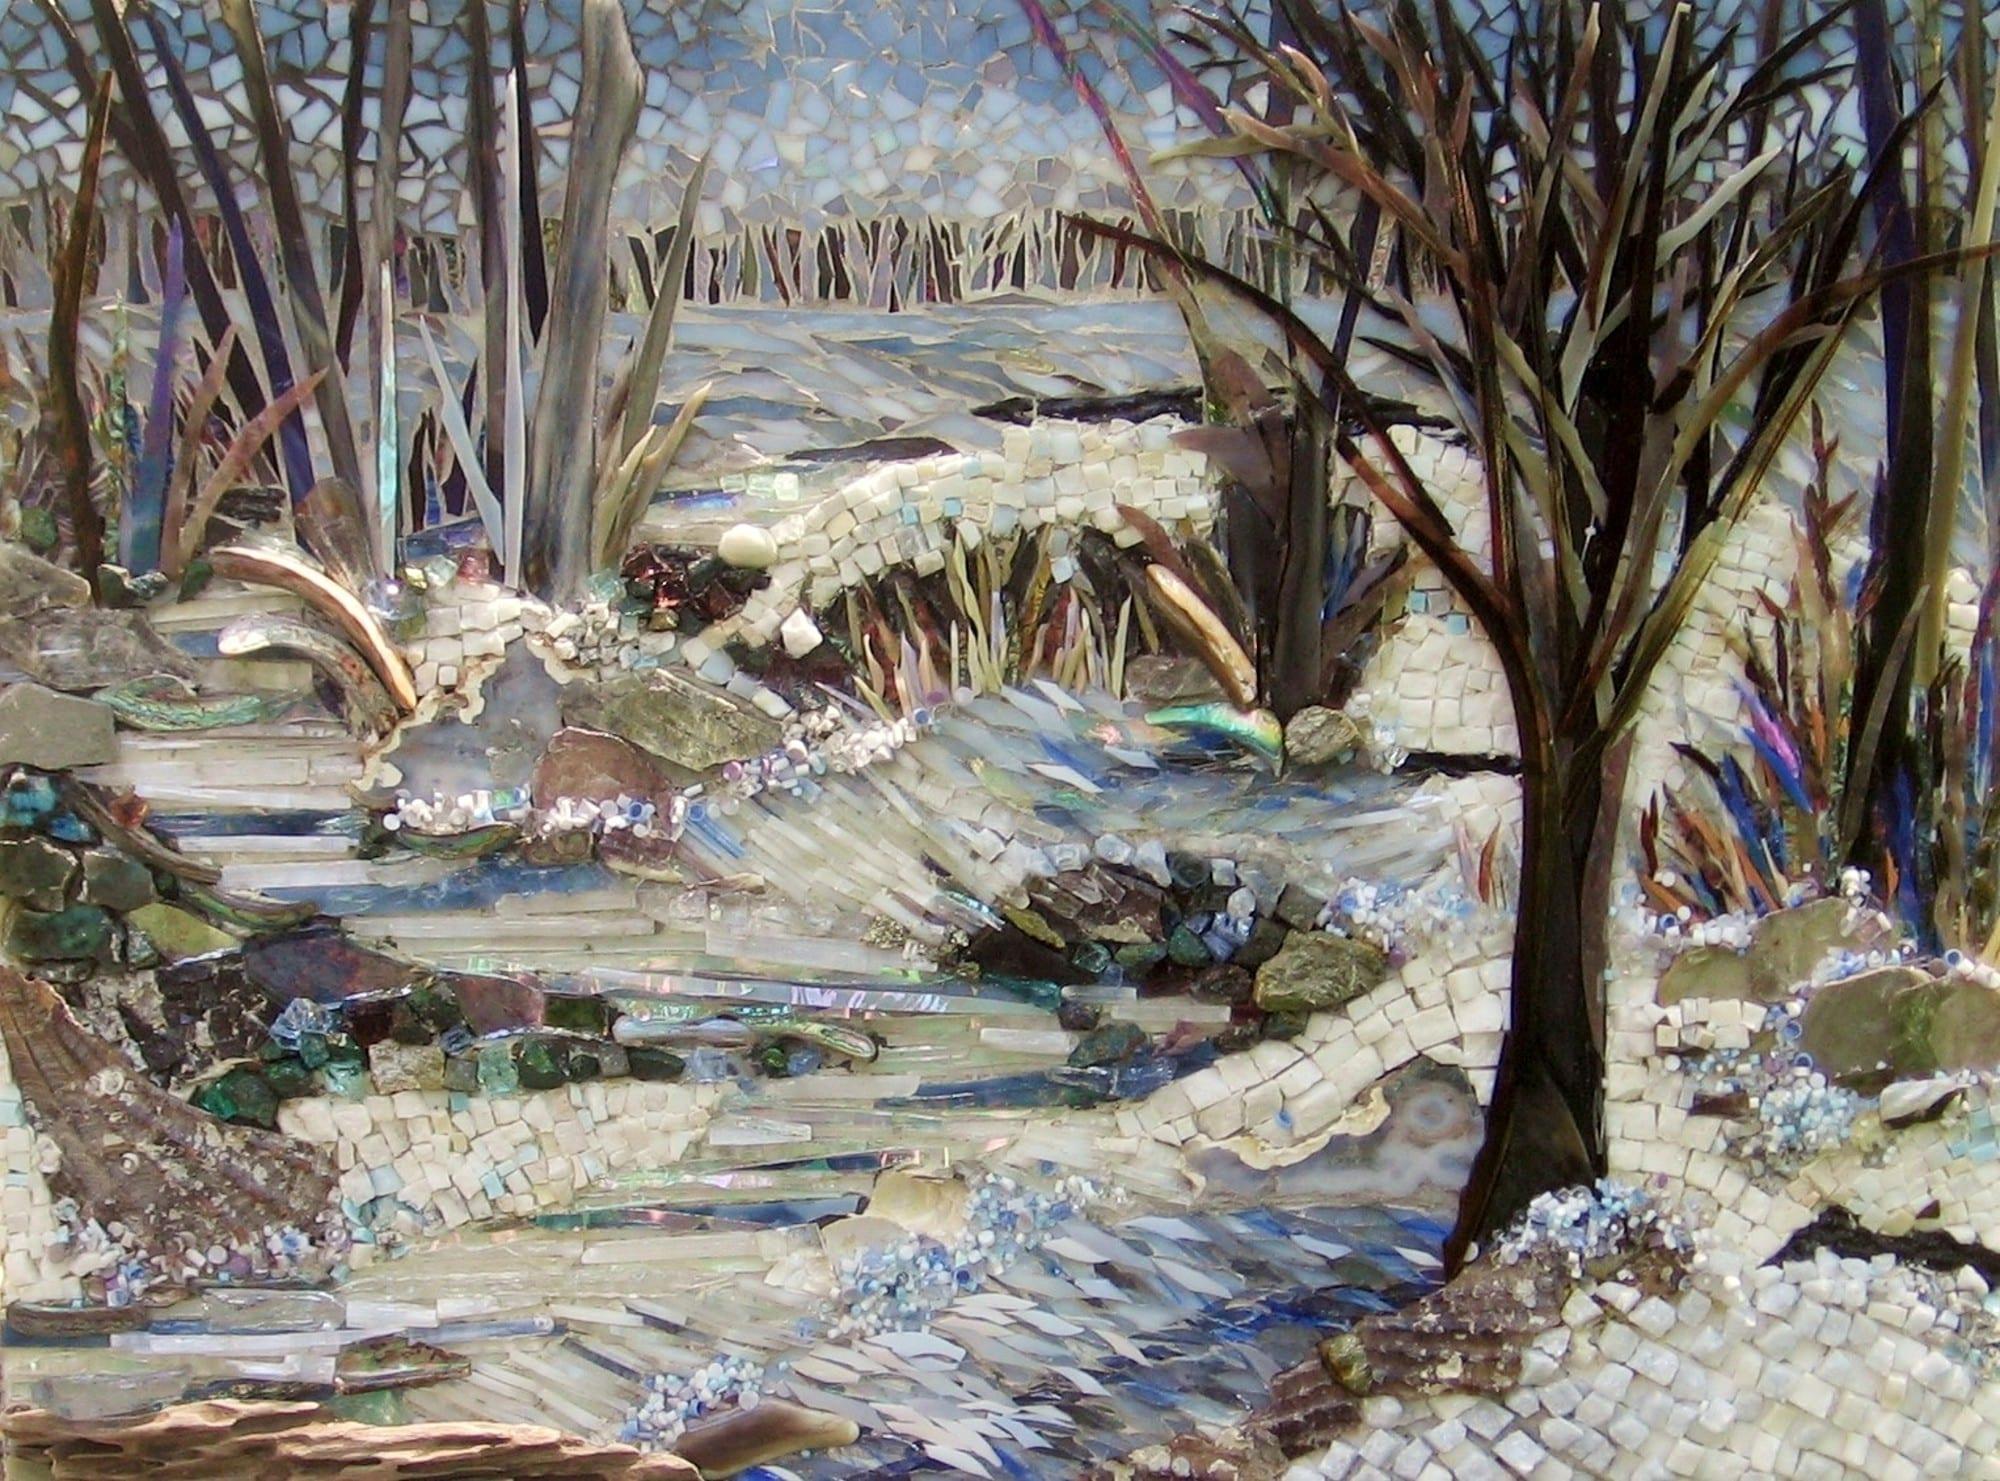 """Winter's Beauty"" by Laura Rendlen. 2012 Juror's Choice; Amy Gundrum Greene"